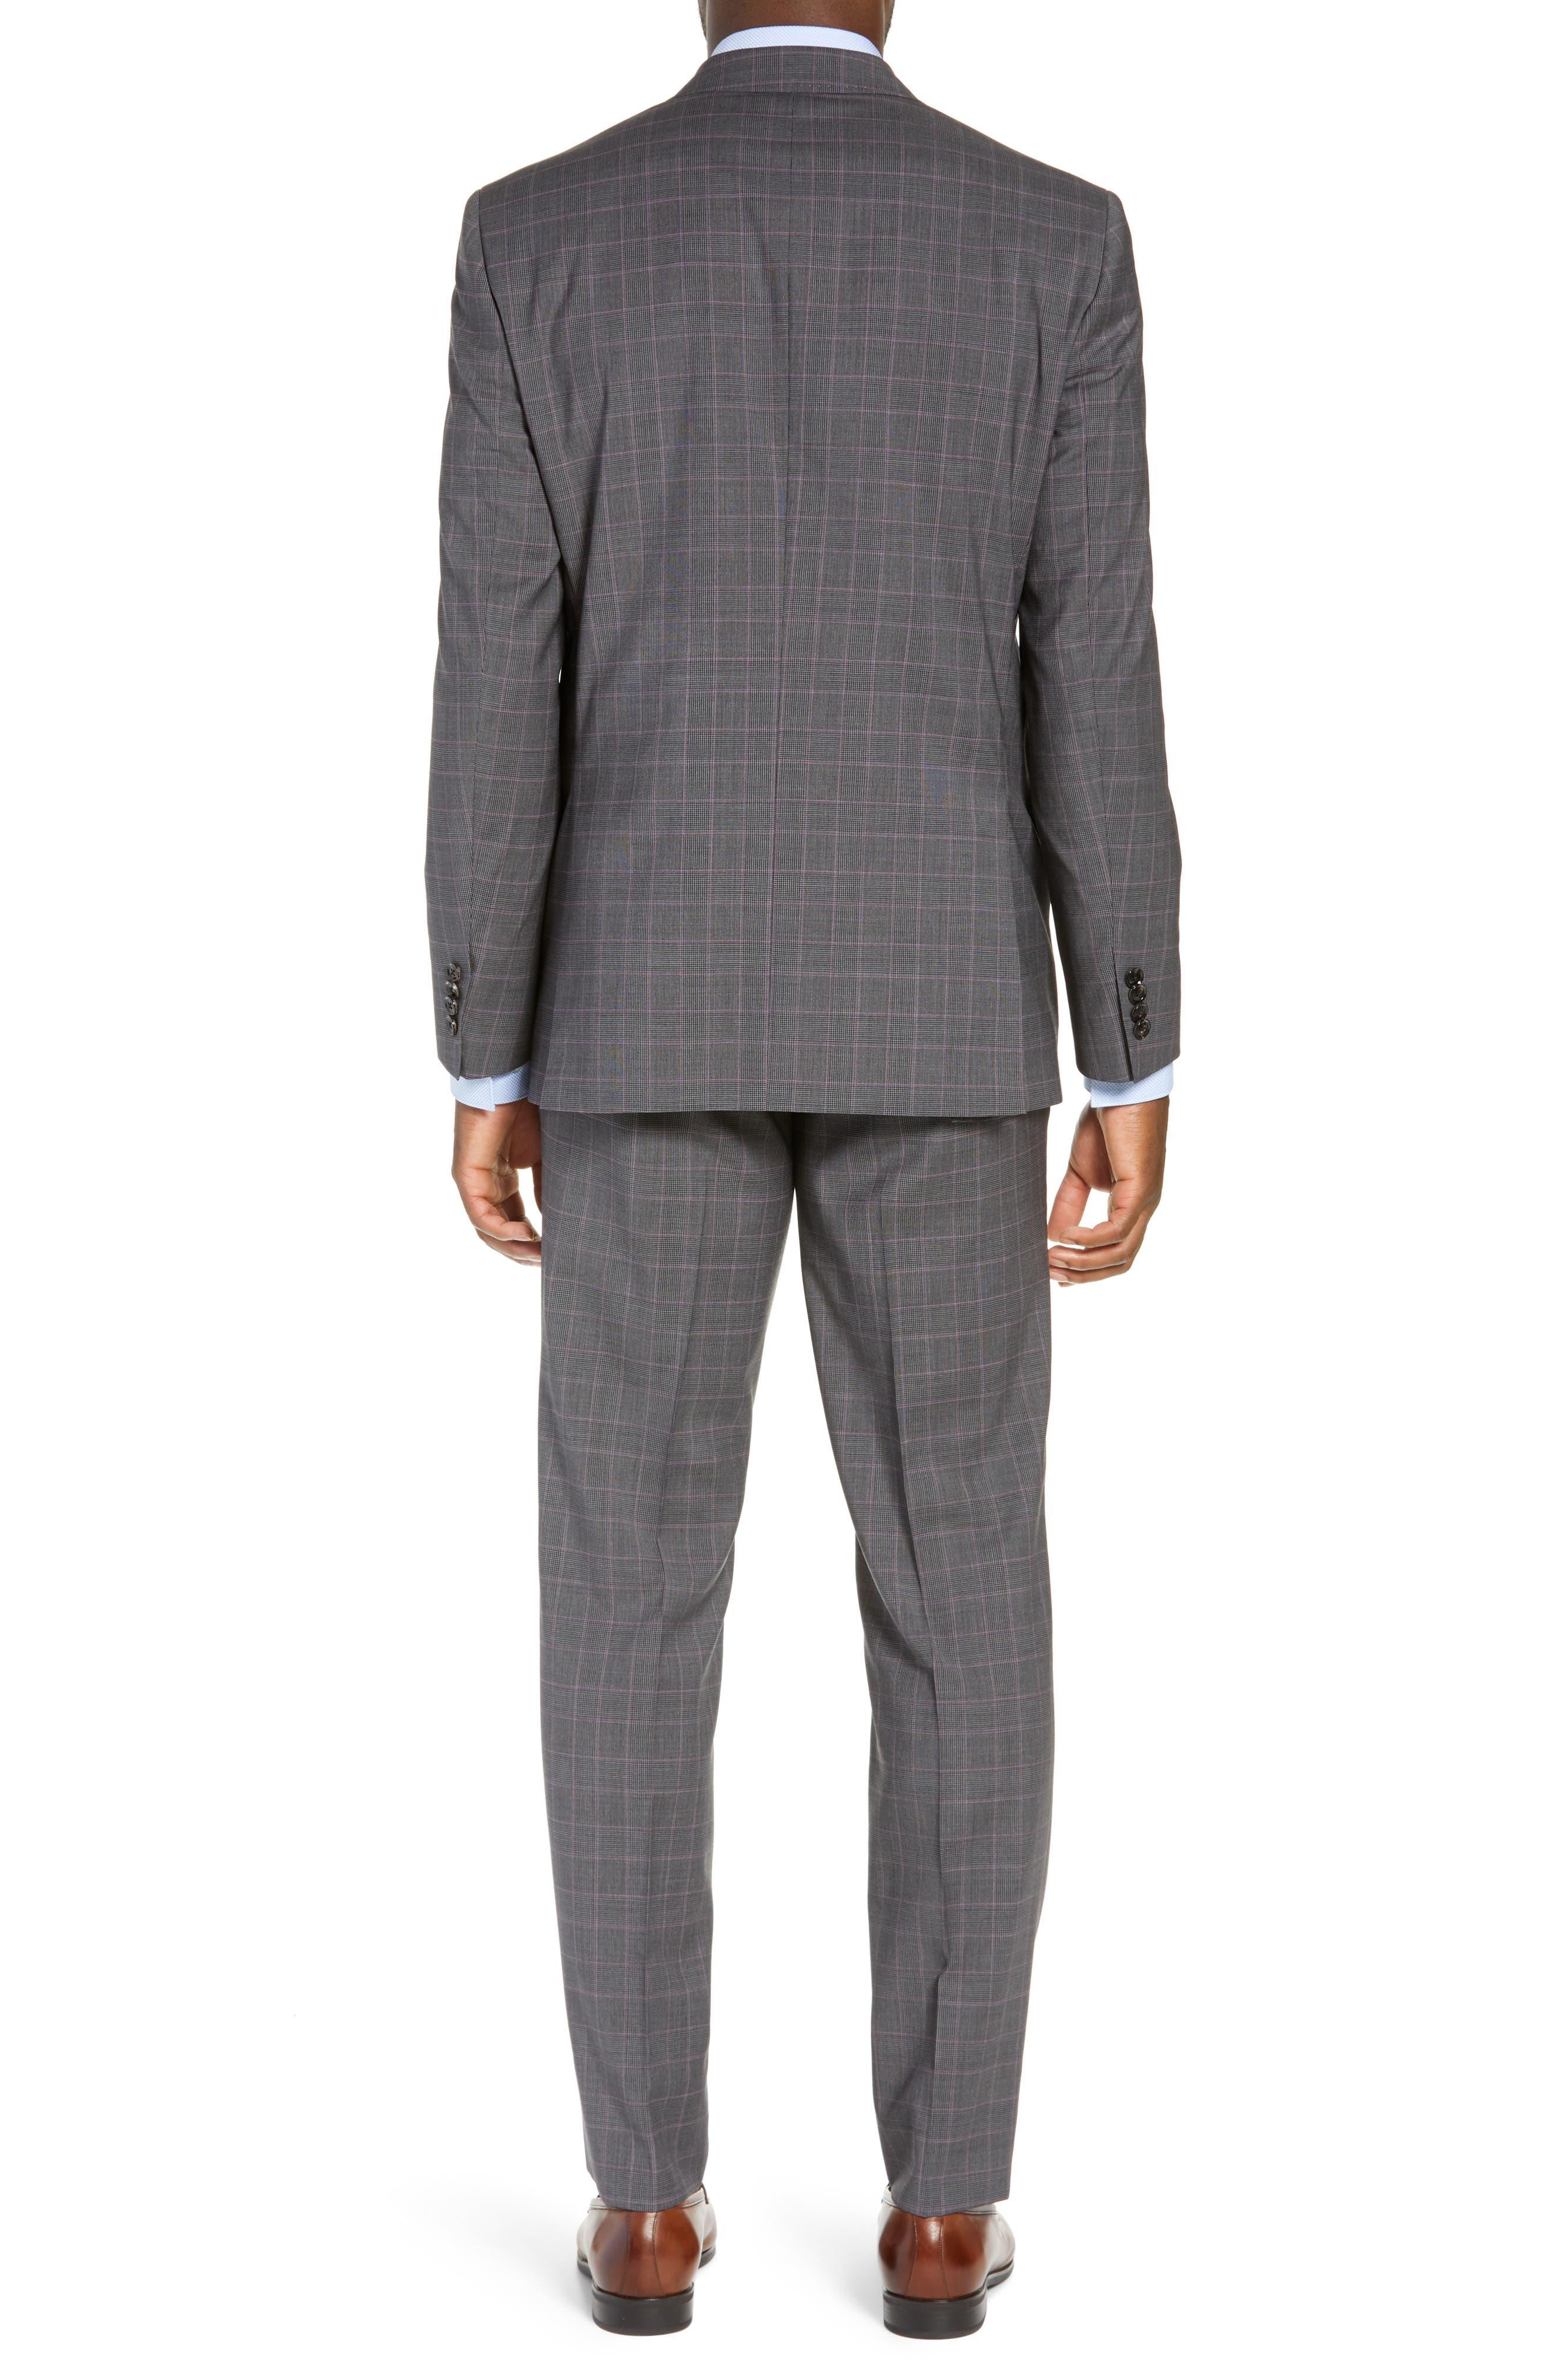 TED BAKER LONDON,                             Jay Trim Fit Plaid Wool Suit,                             Alternate thumbnail 2, color,                             GREY